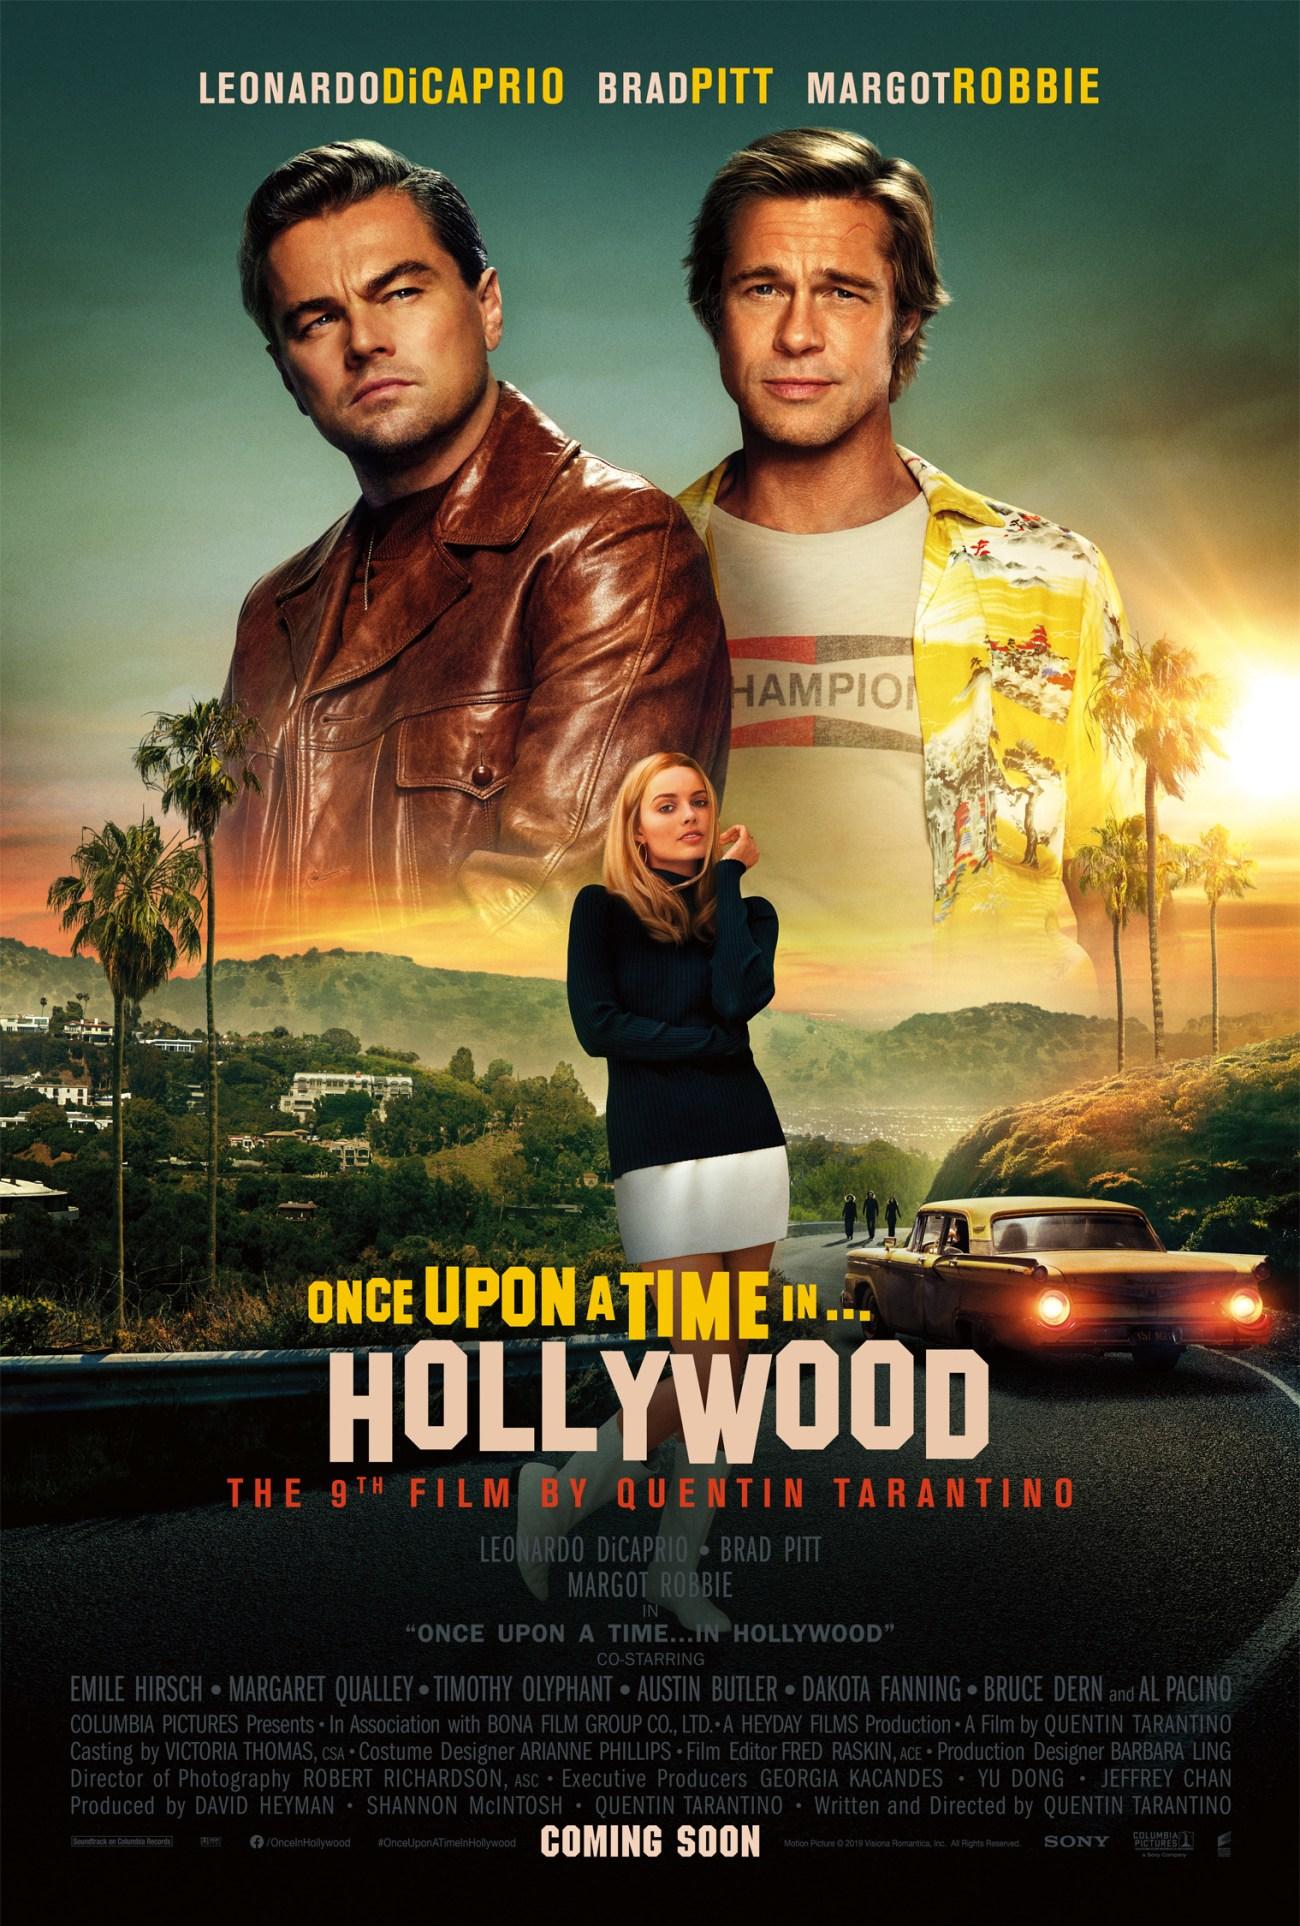 Póster de Once Upon a Time in Hollywood (2019). Imagen: impawards.com